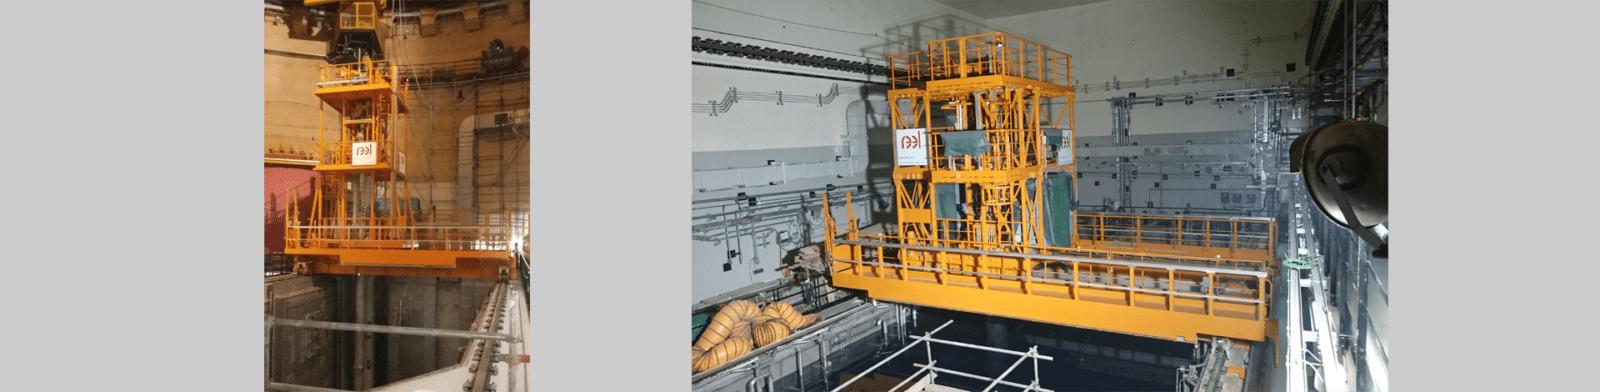 EPR Fuel Handling System